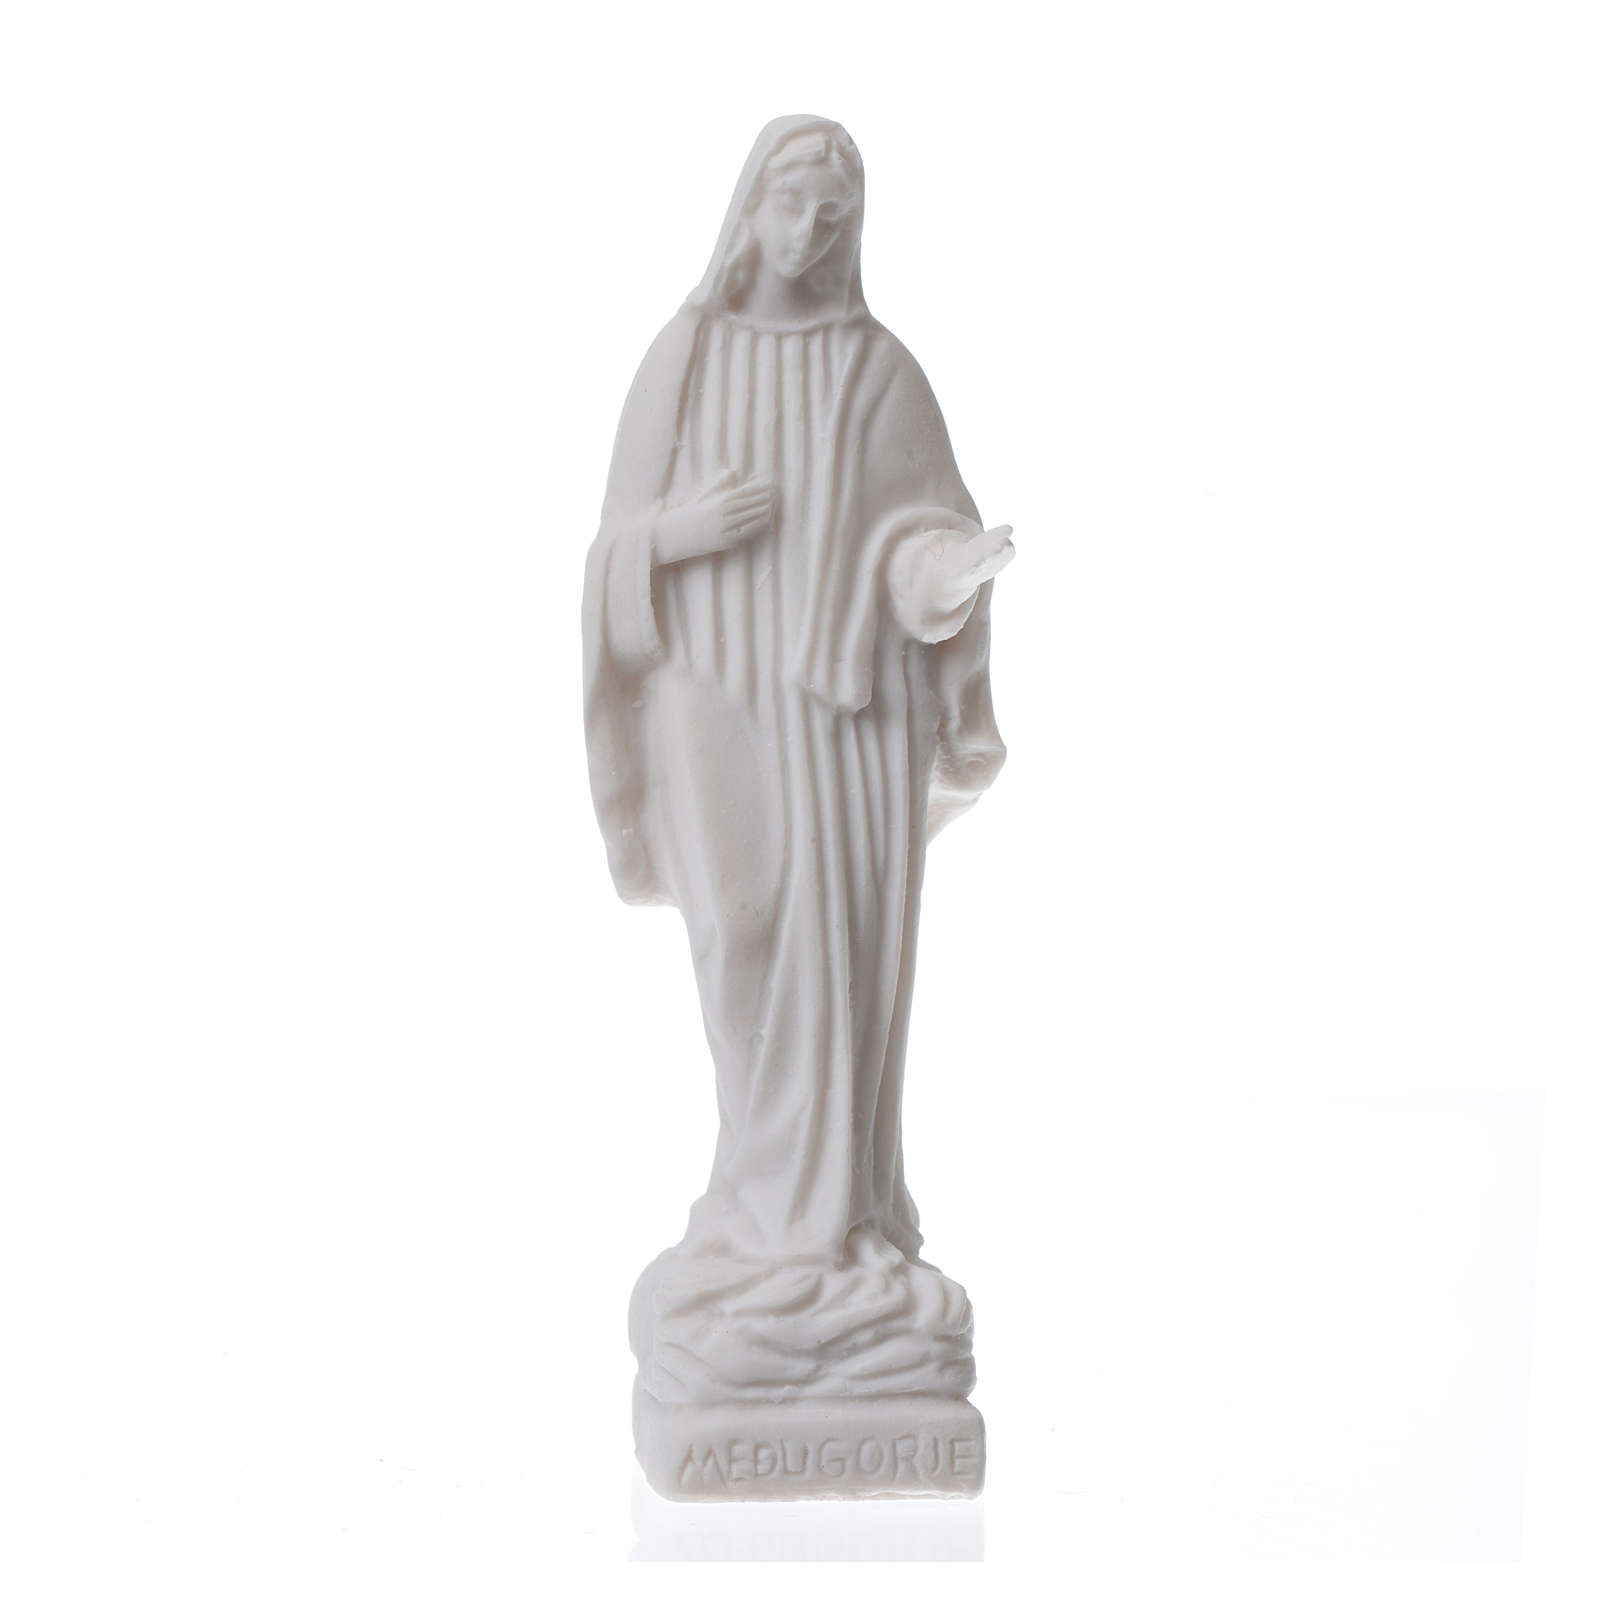 Statuetta Madonna Medjugorje h. 9 cm 4